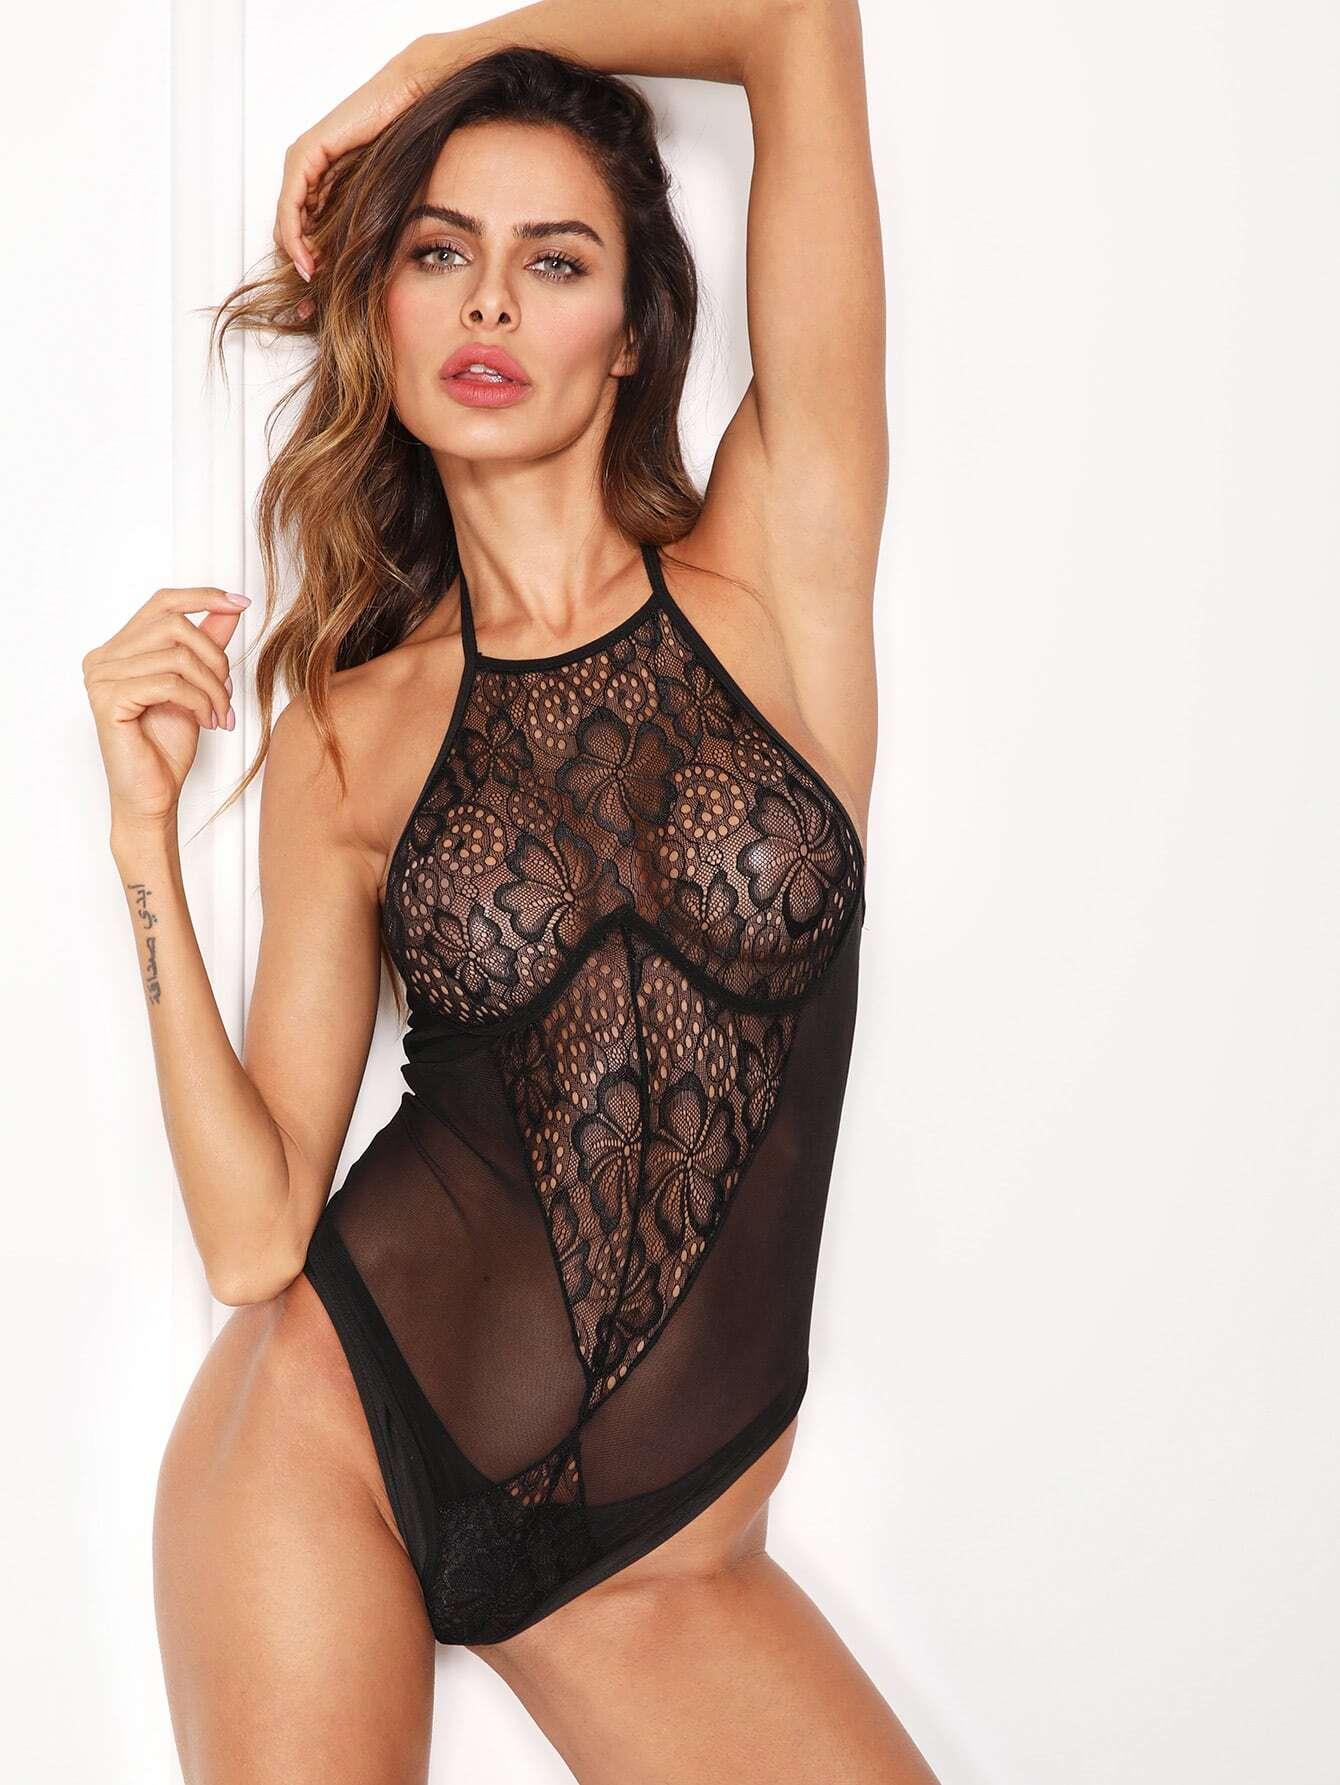 Lace Halter Open Back Teddy lingerie180125476